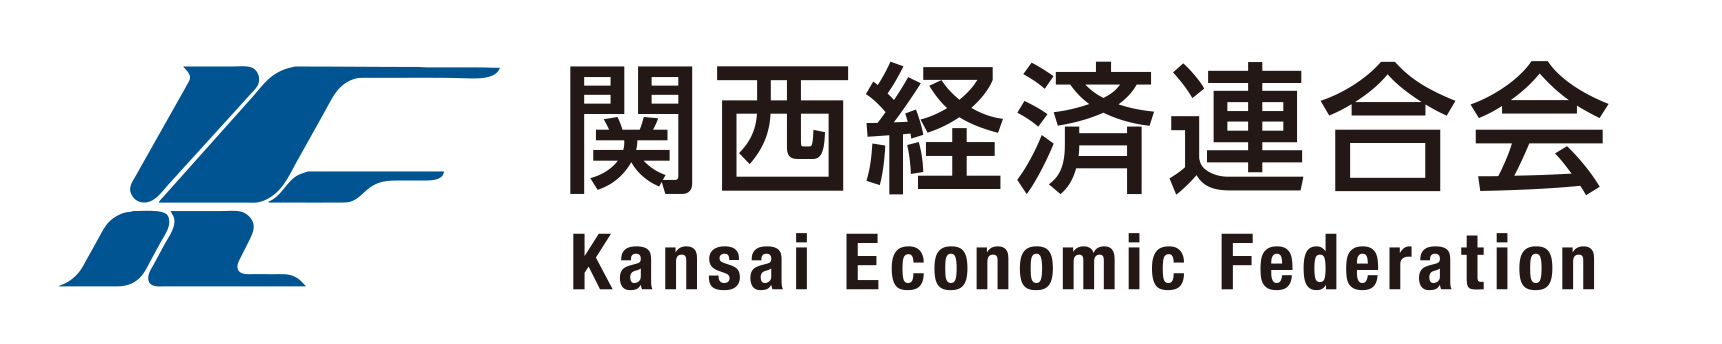 Kansai Economic Federation